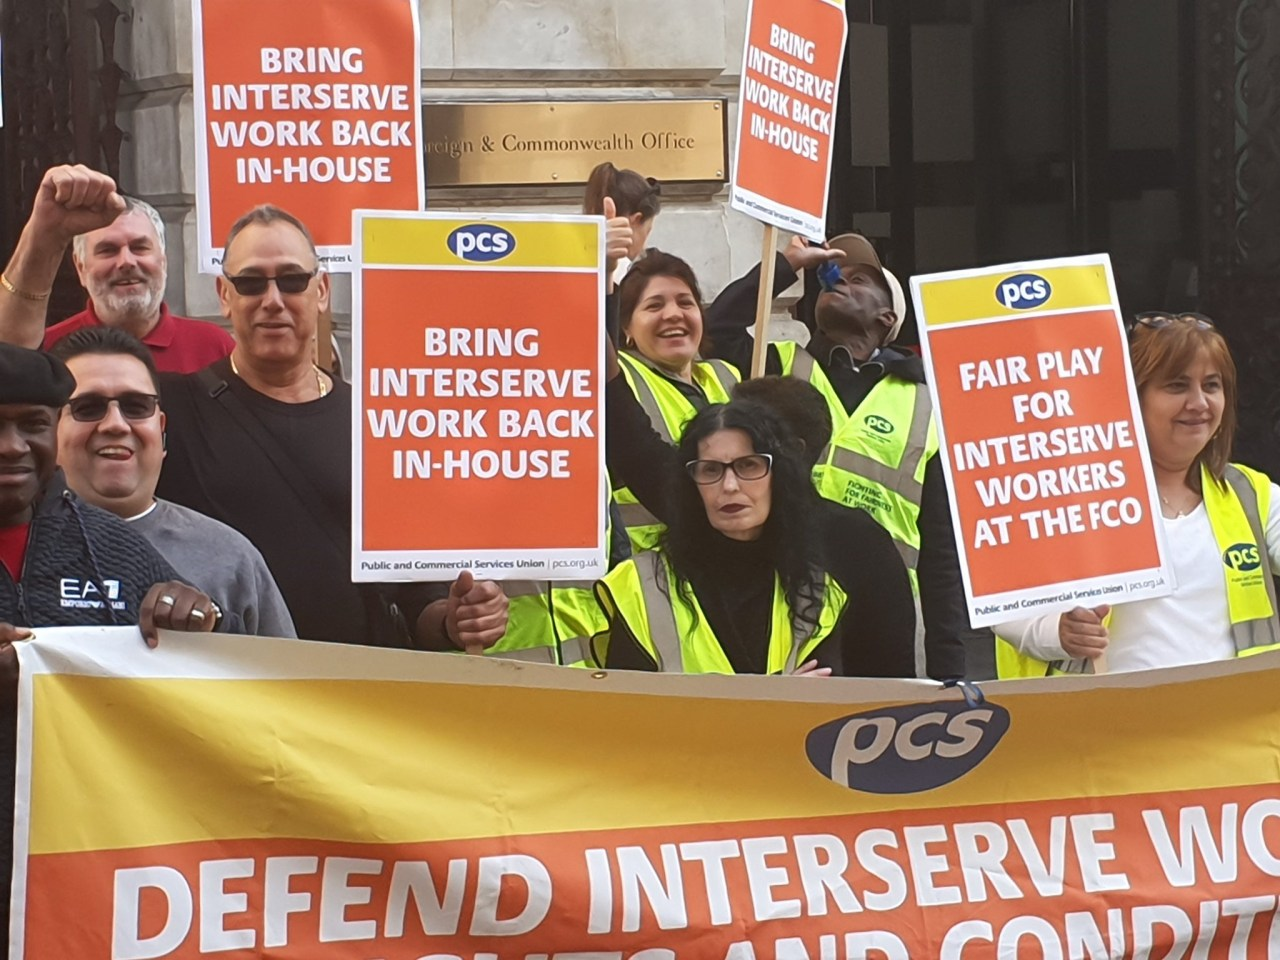 PCS Interserve strikers